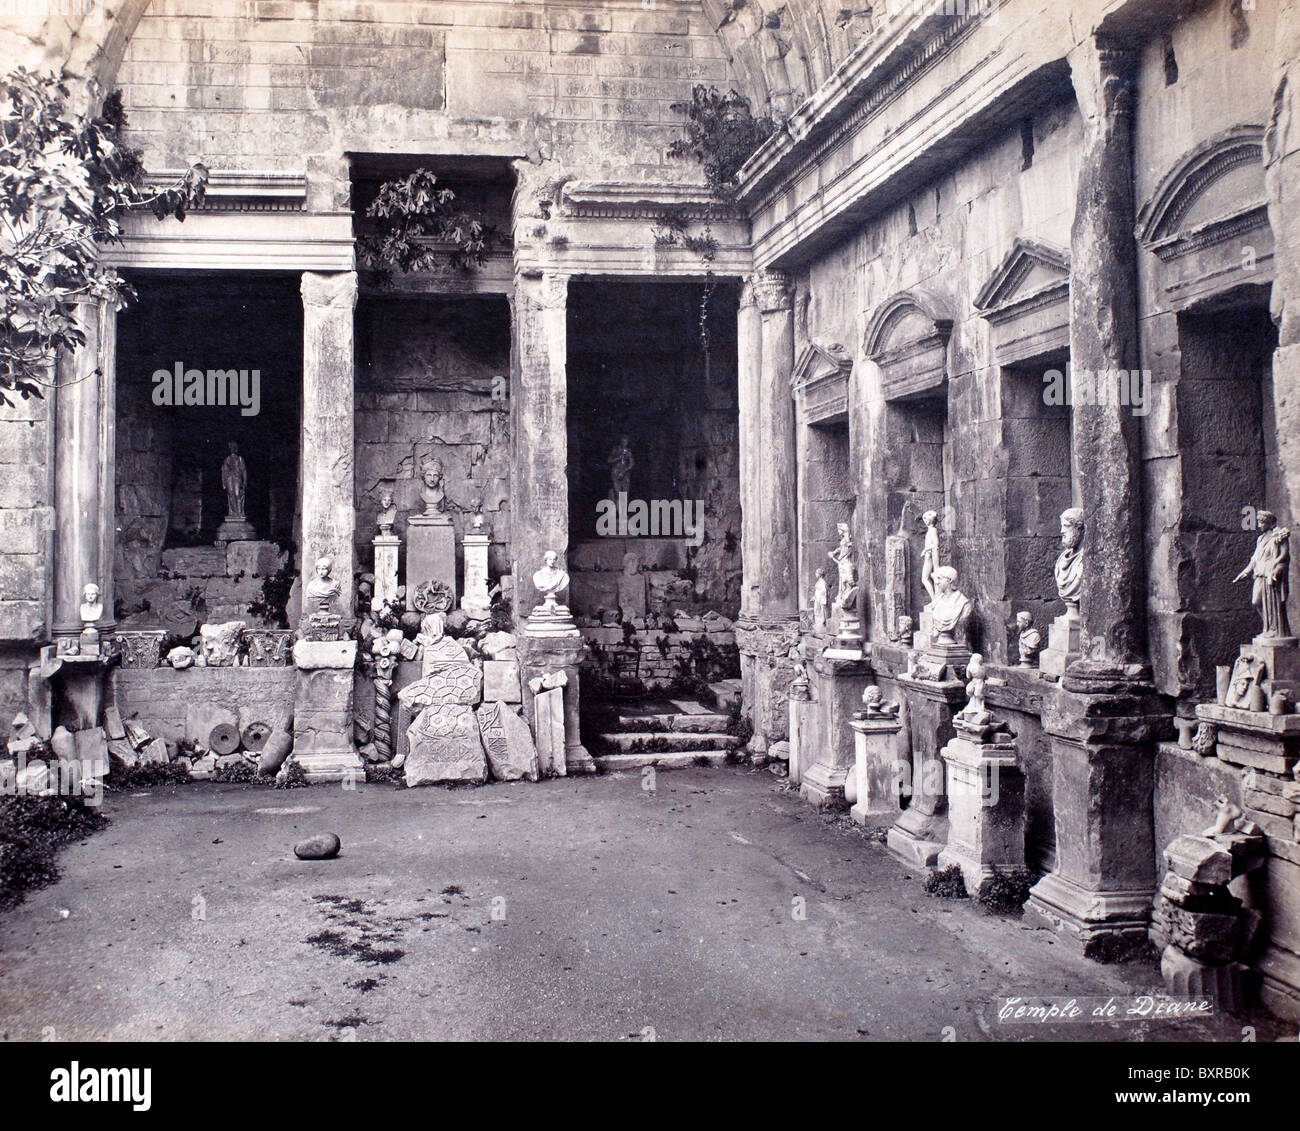 Interior of the Roman Temple of Diana, in the Jardin de la ...